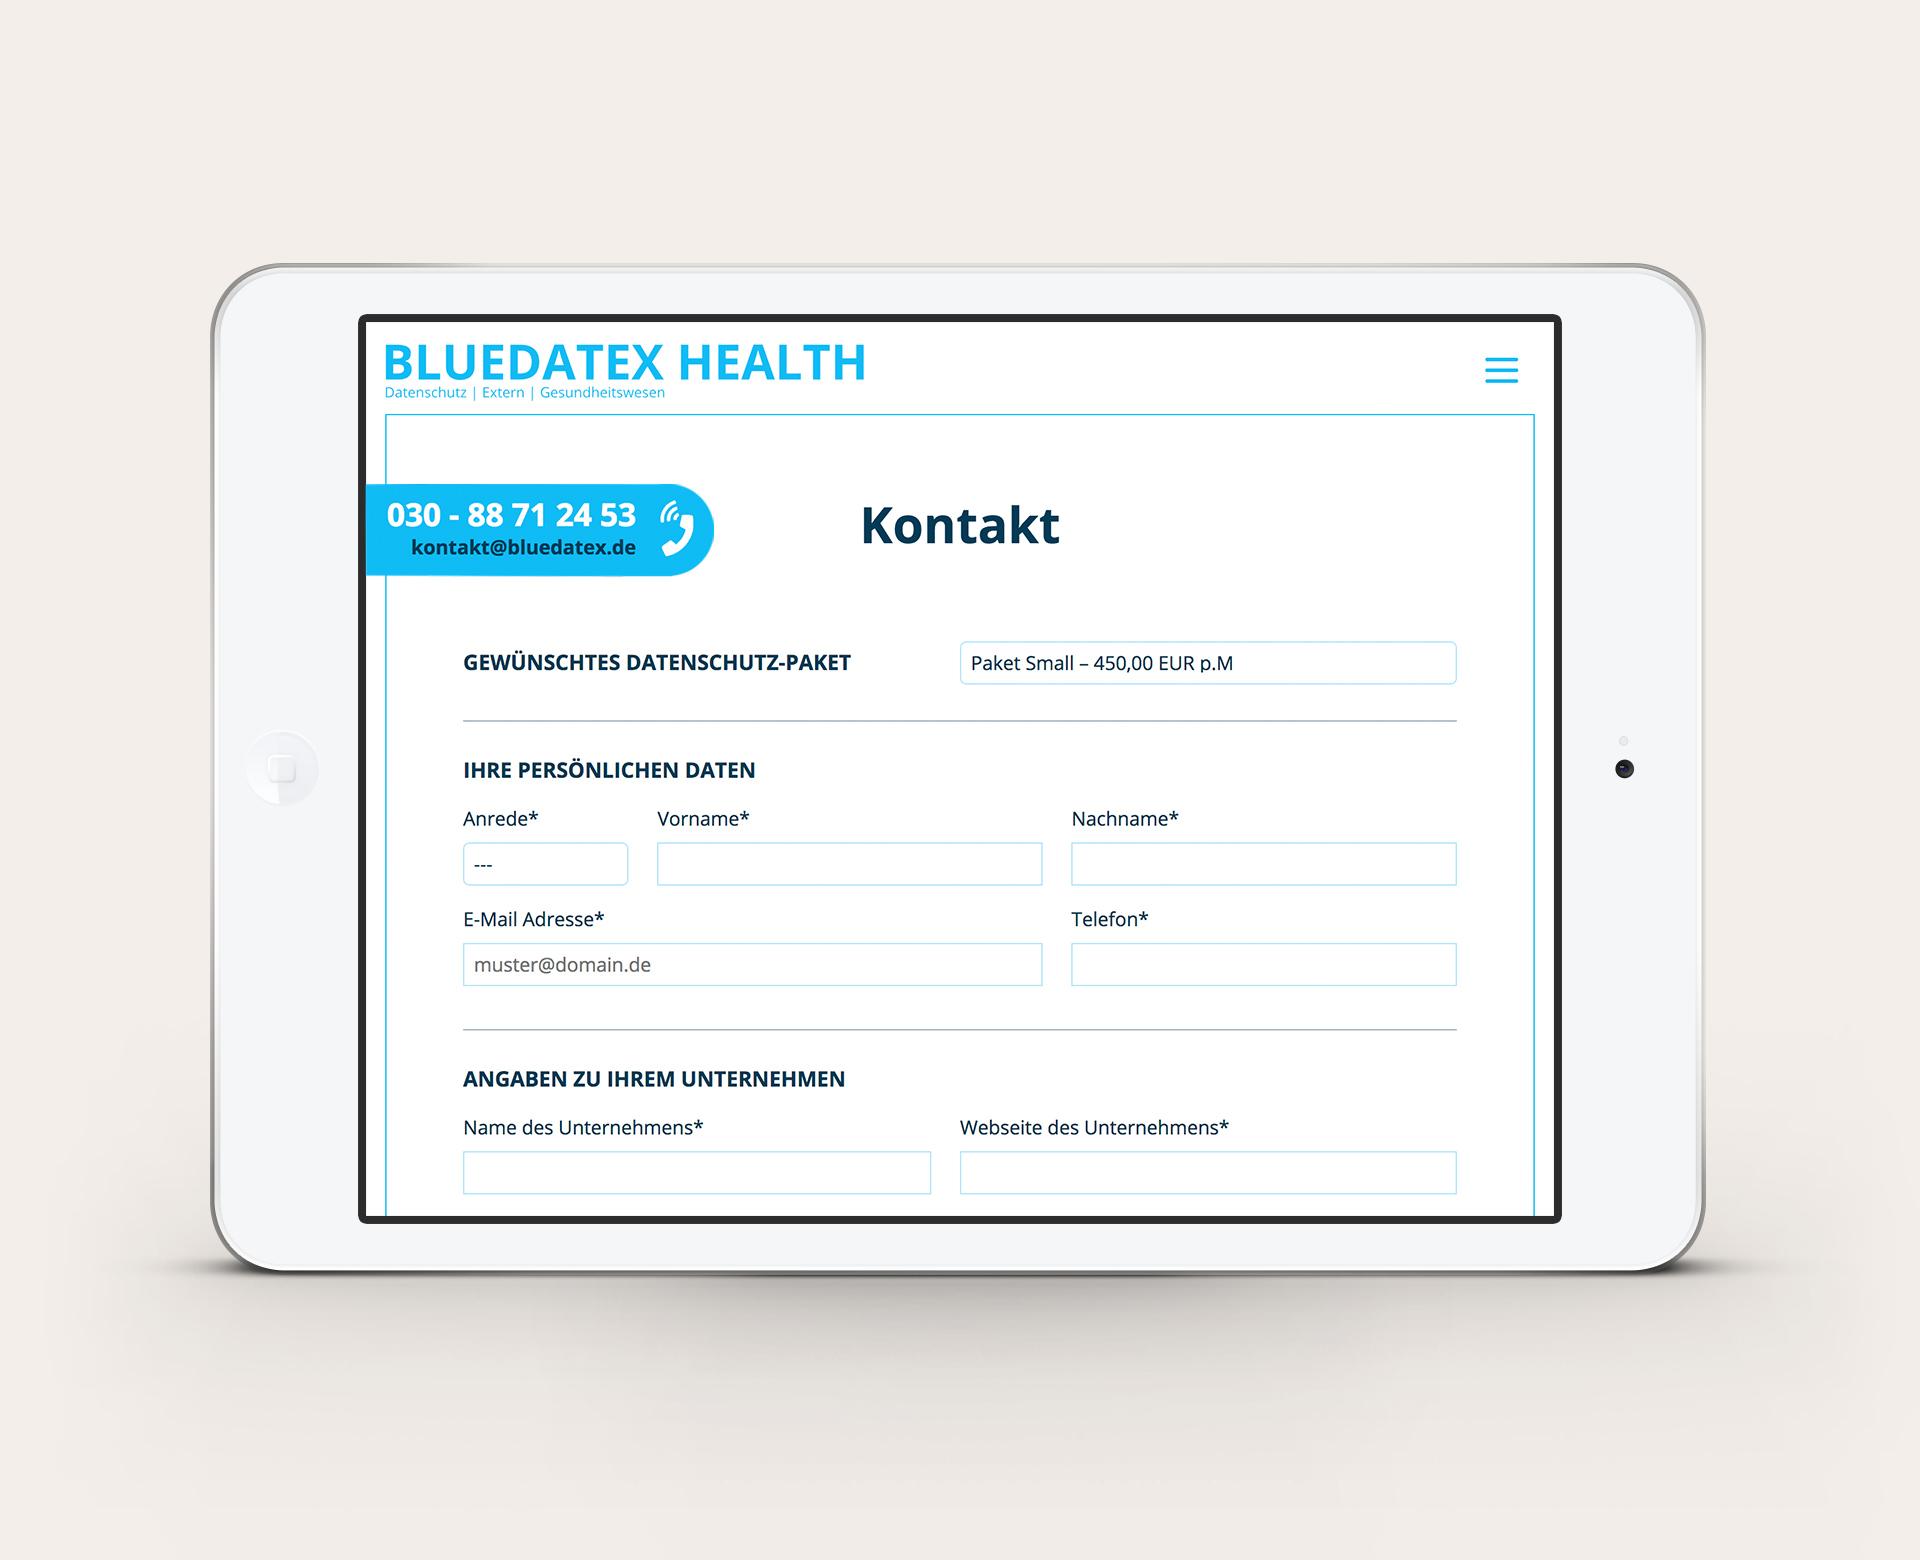 Bluedatex Health Kontakt Anfrage per IPad